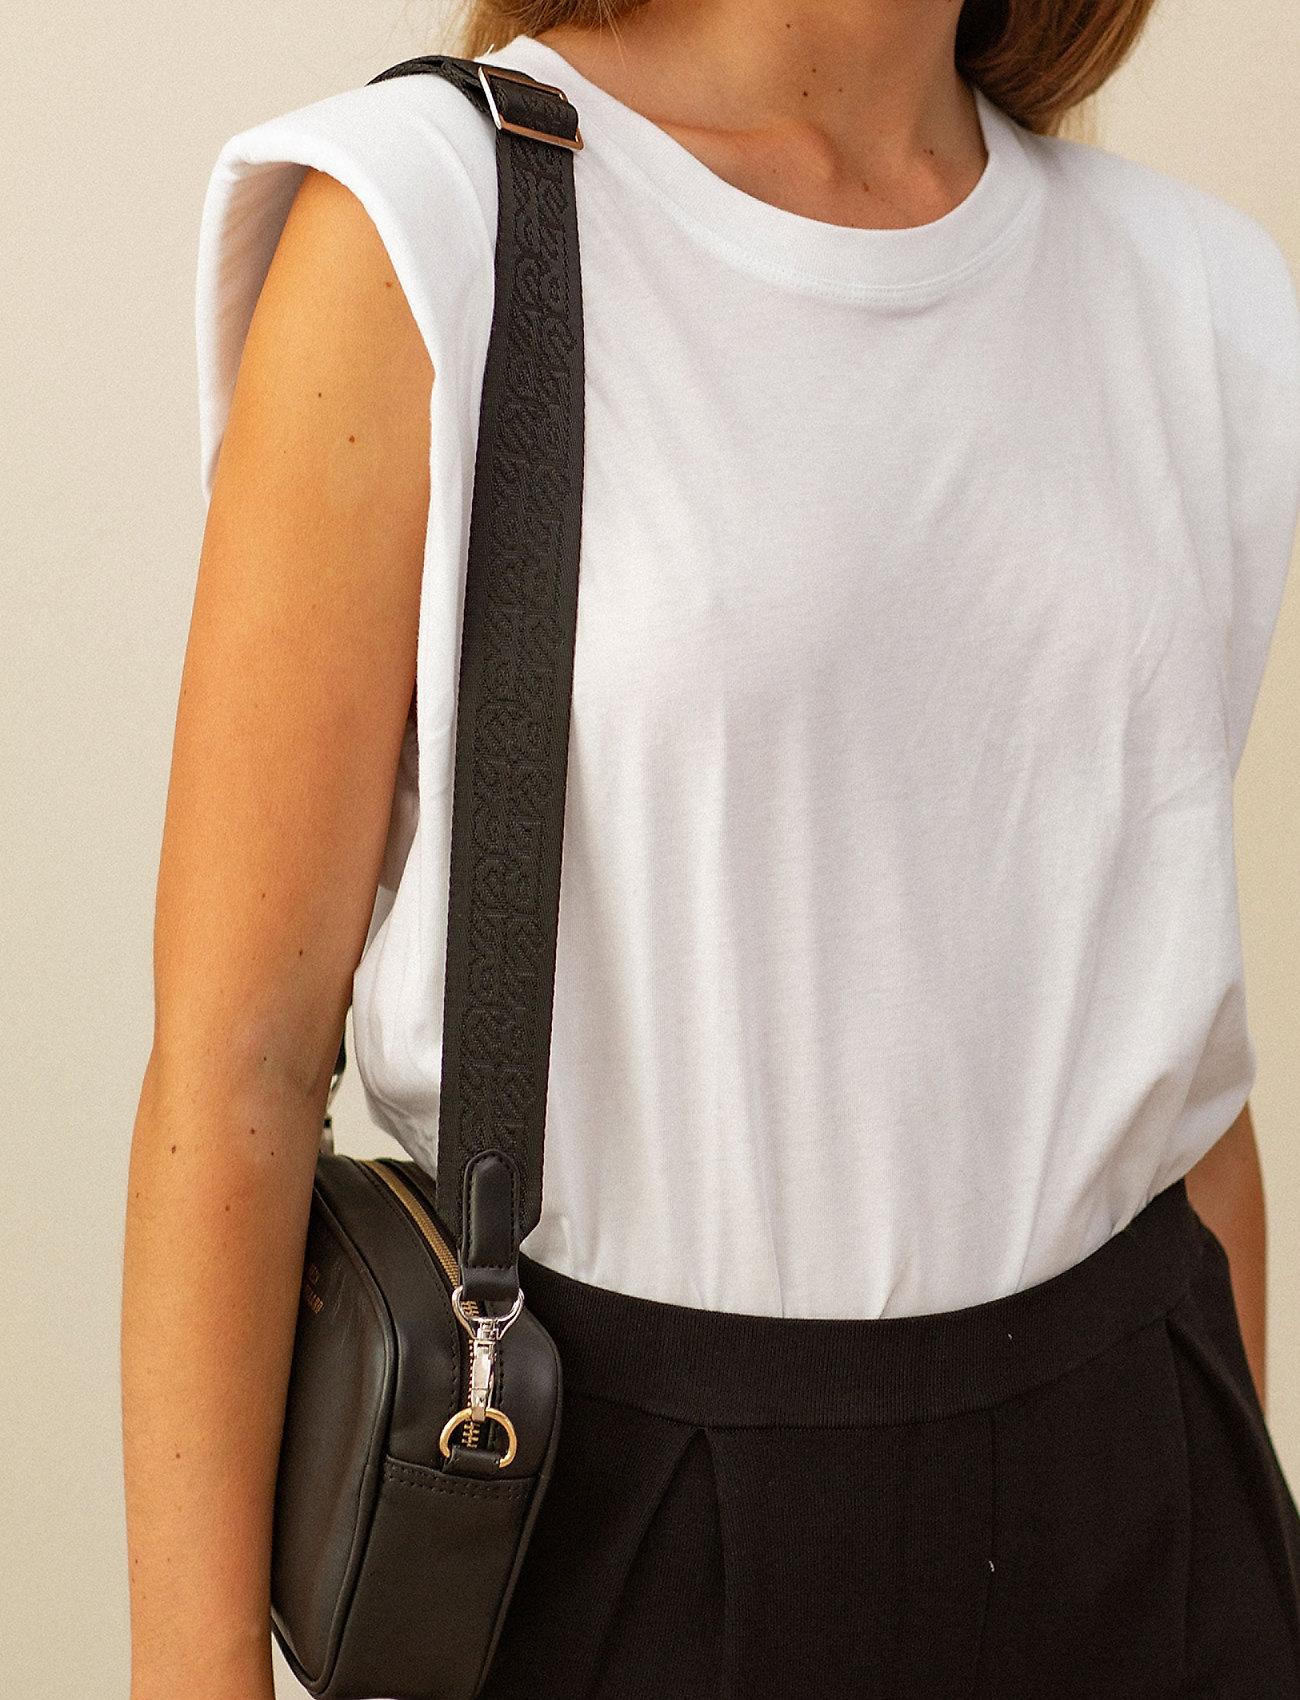 Becksöndergaard - BS Simple Strap - bag straps - black - 0